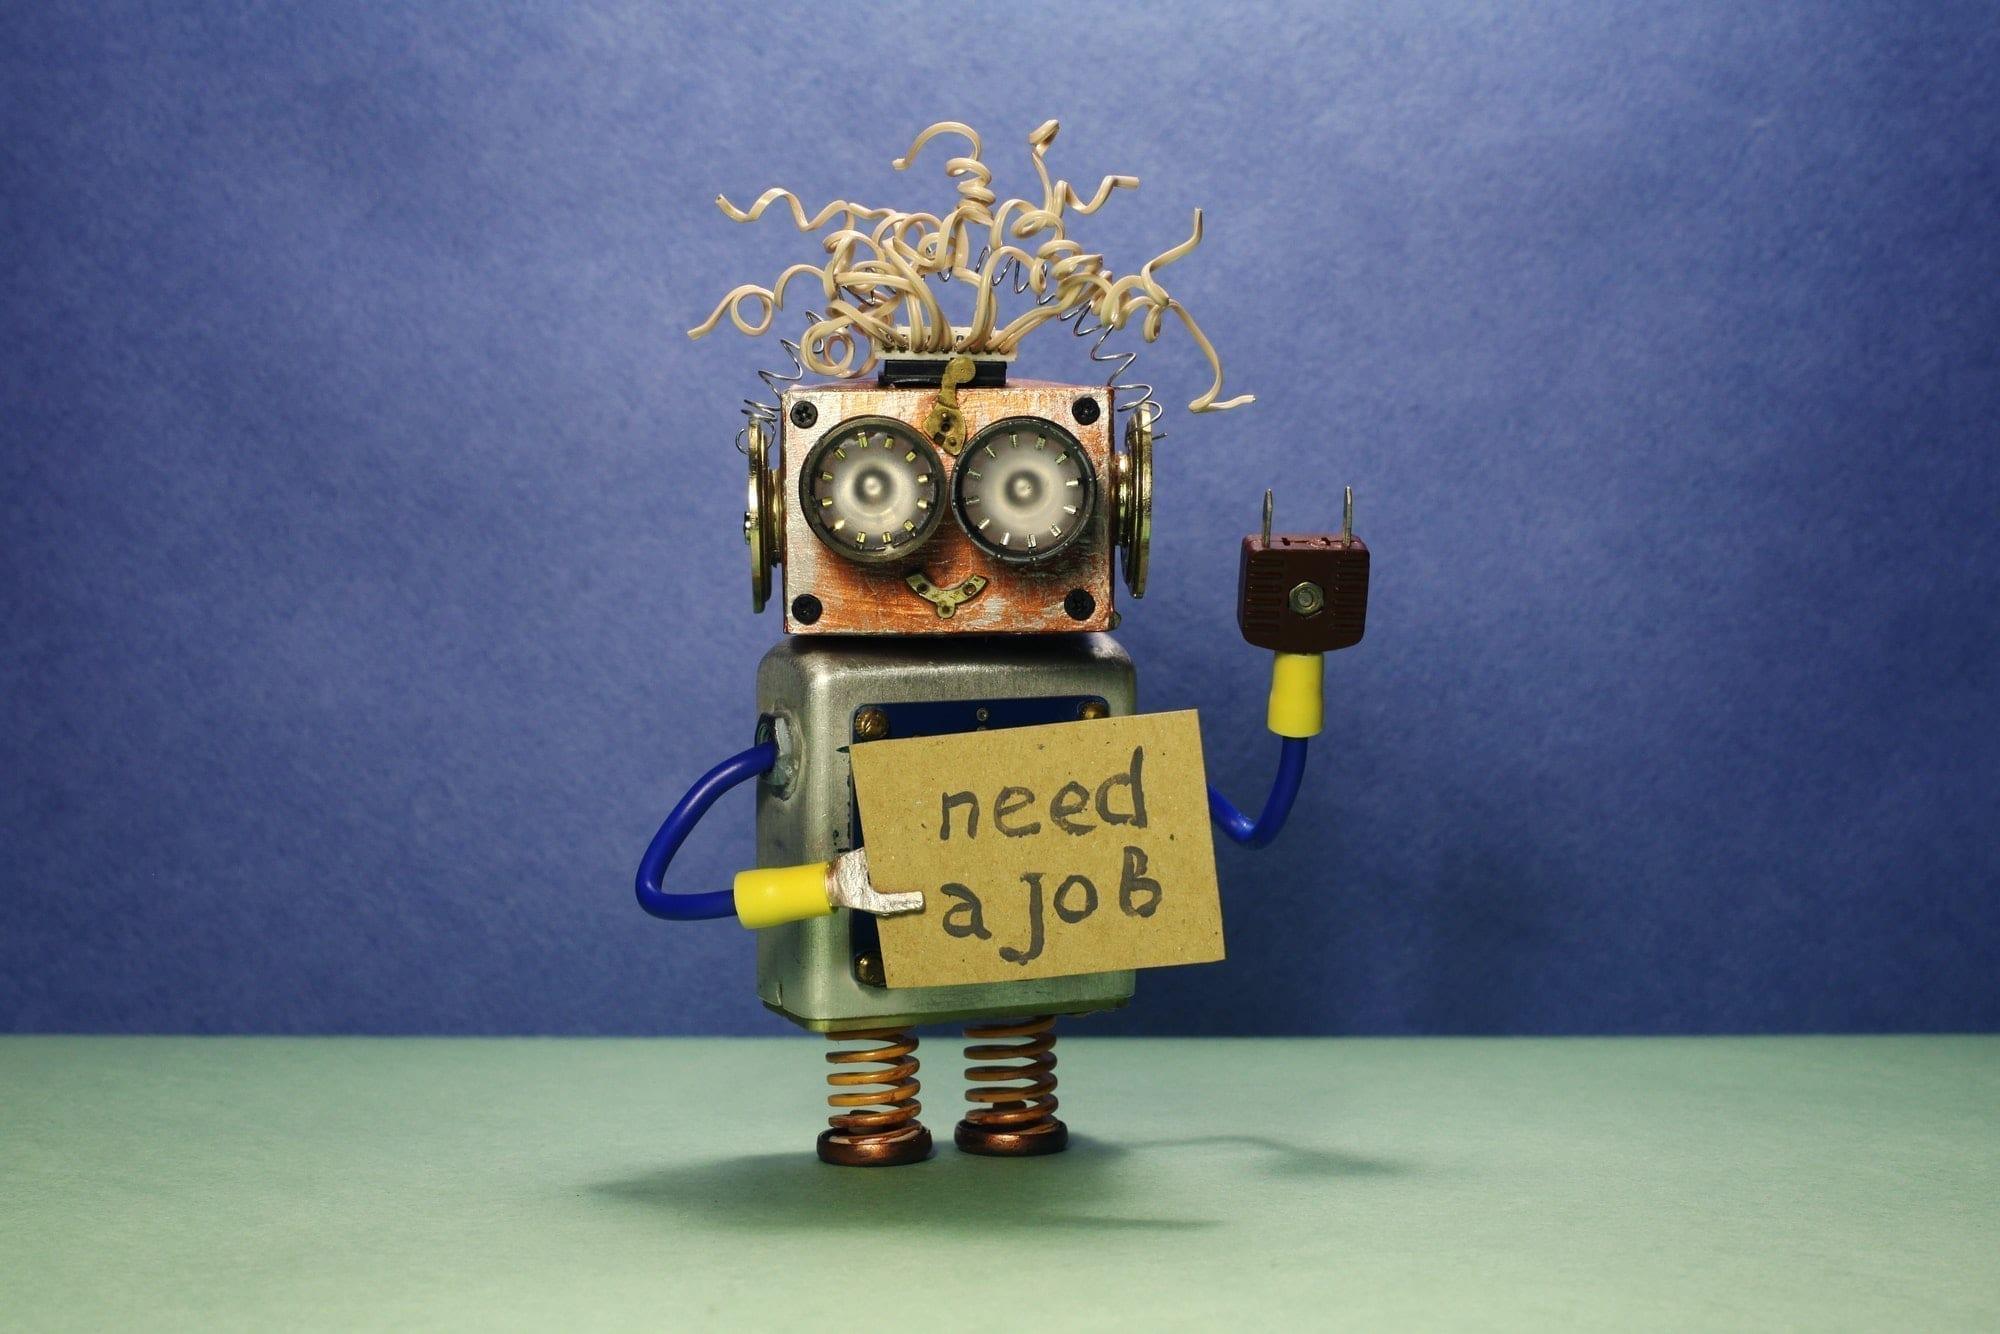 Cartoon robot holding a need a job sign